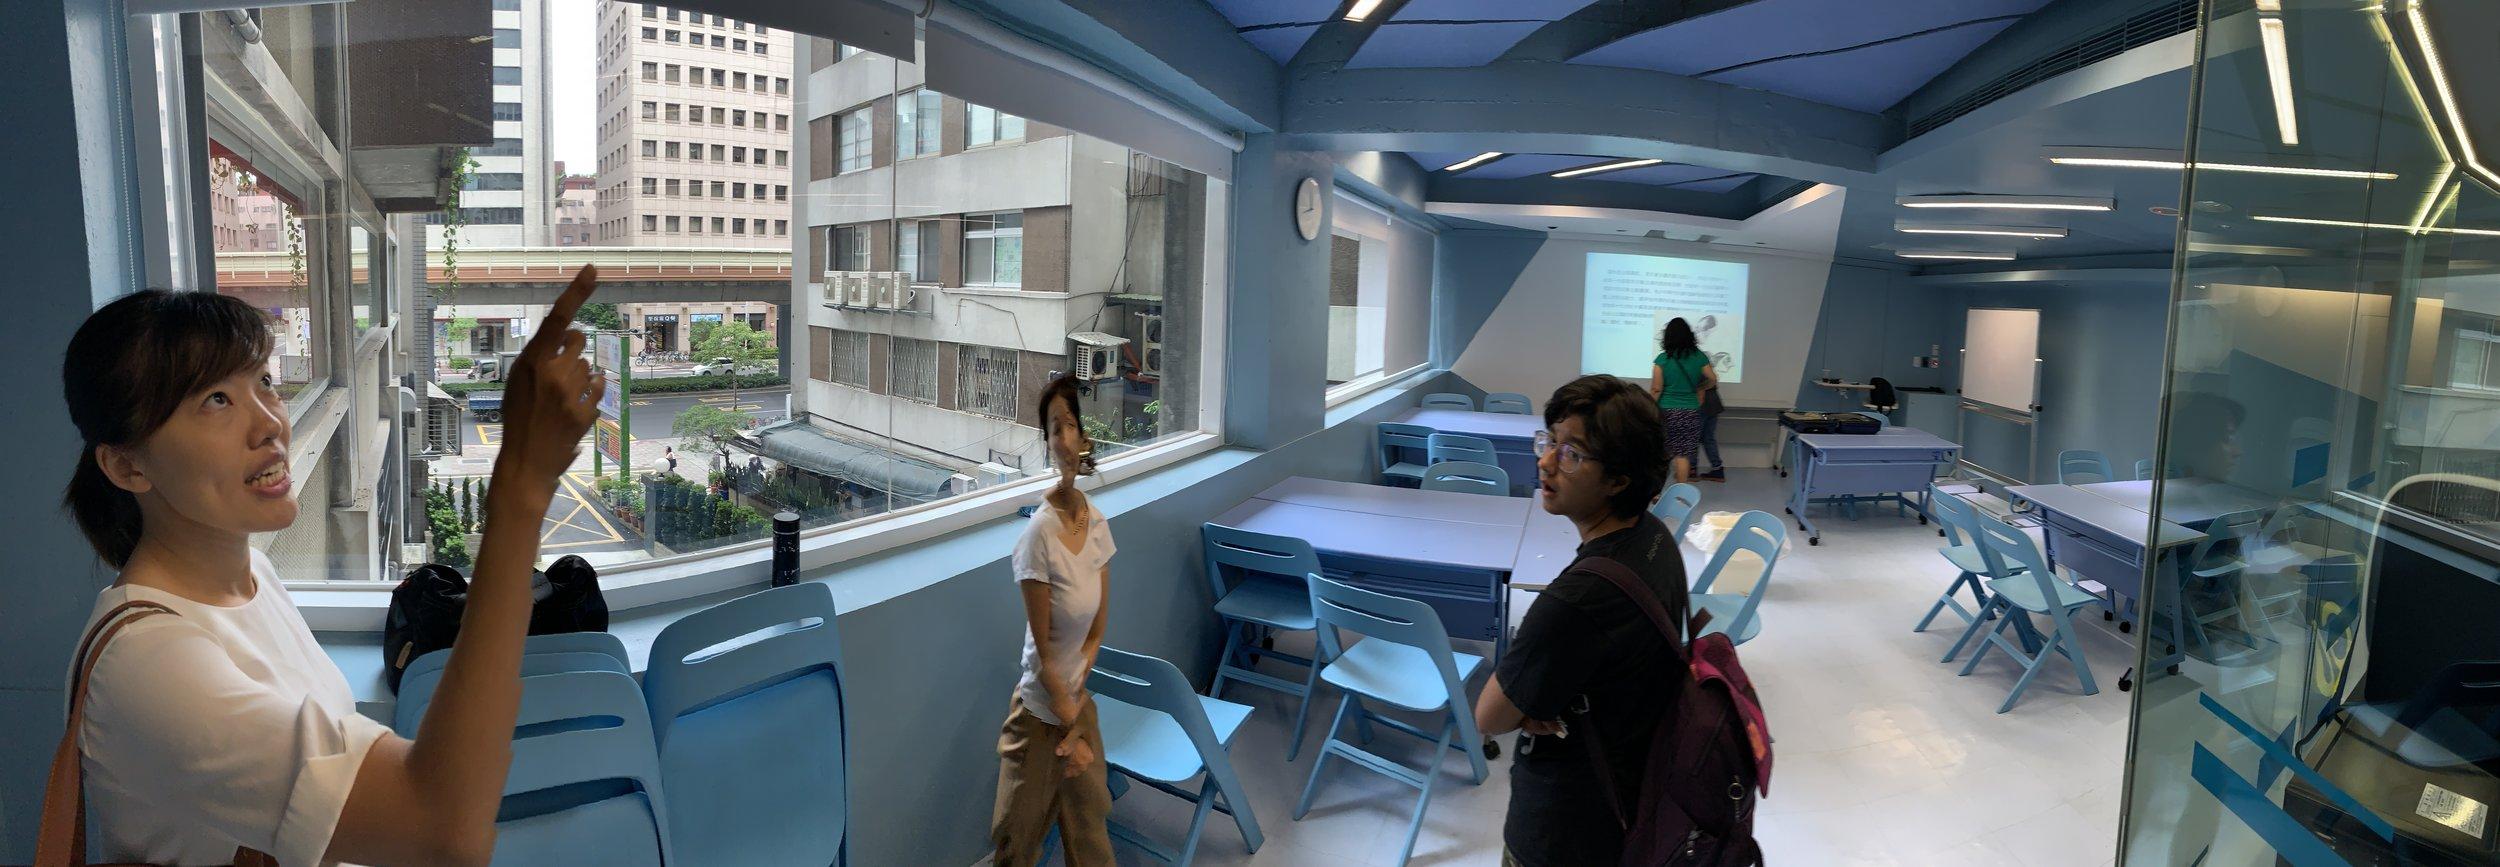 Excelsior Learning centre.JPG